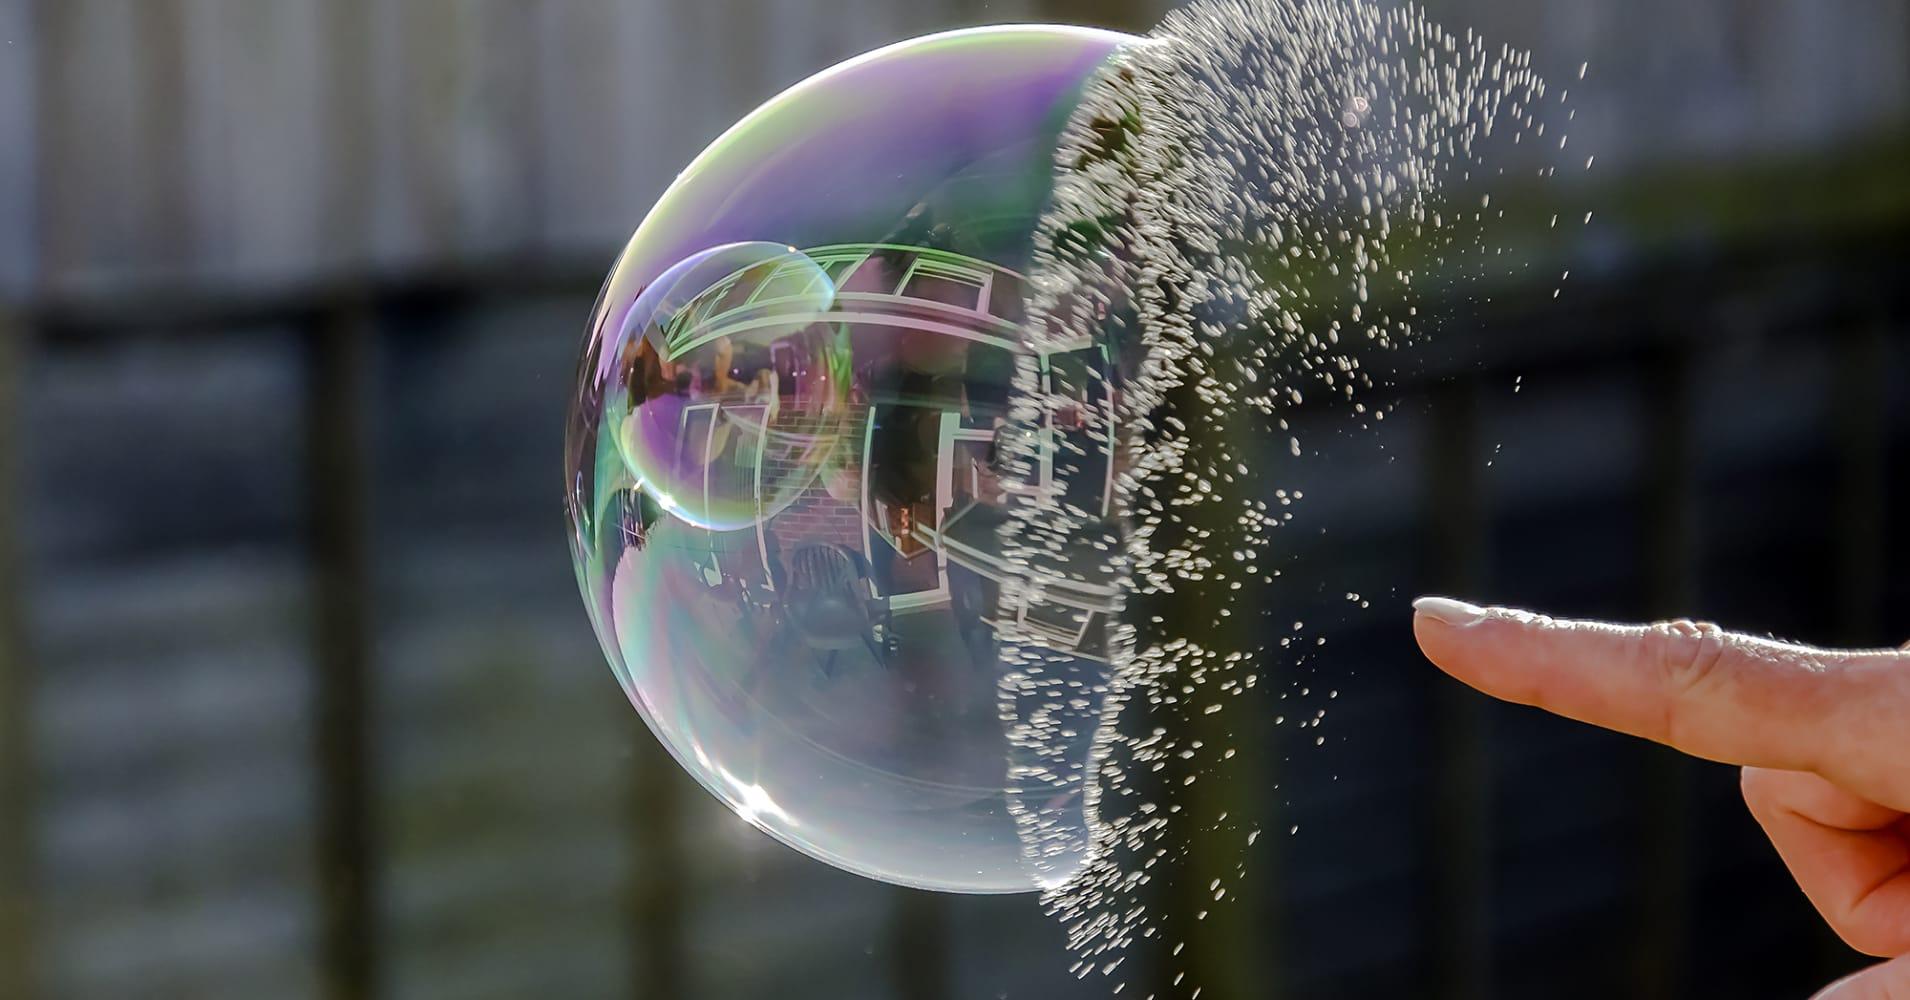 Tech Stocks Flashing A Warning Similar To Before Dotcom Bubble Popped